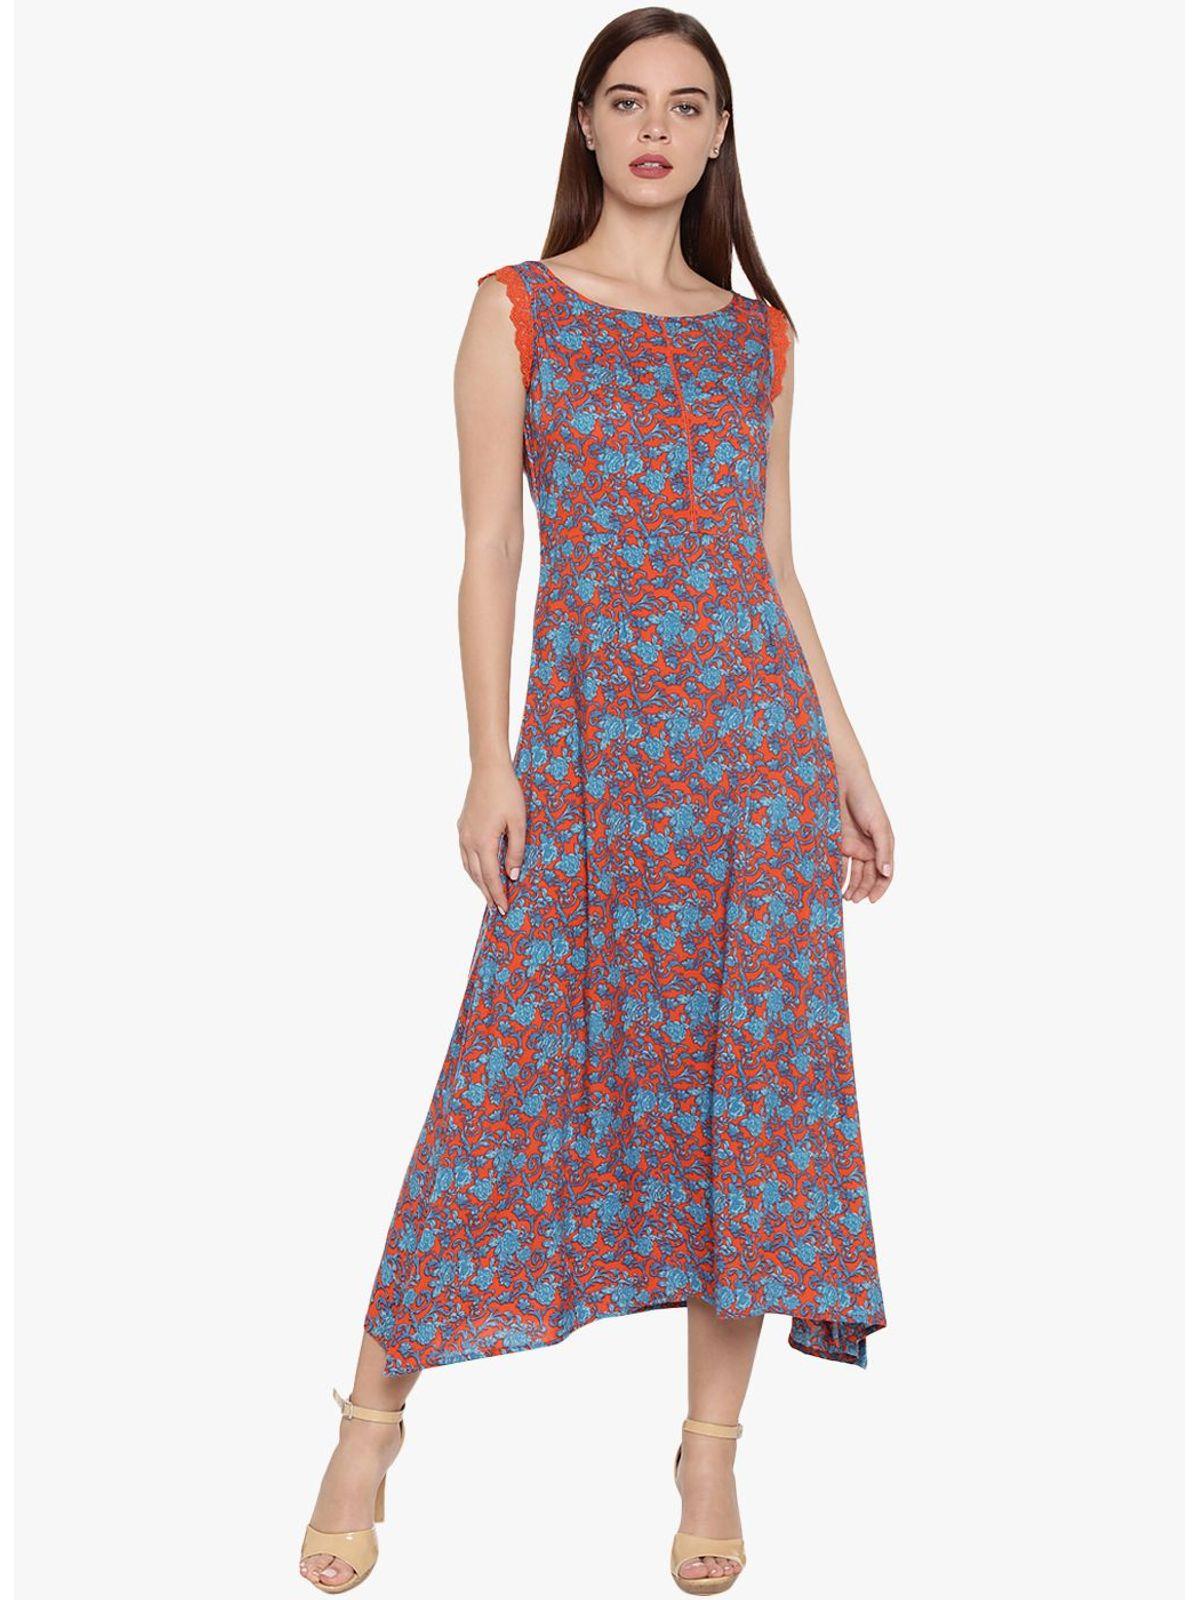 BERNIE ANKLE LENGTH DRESS